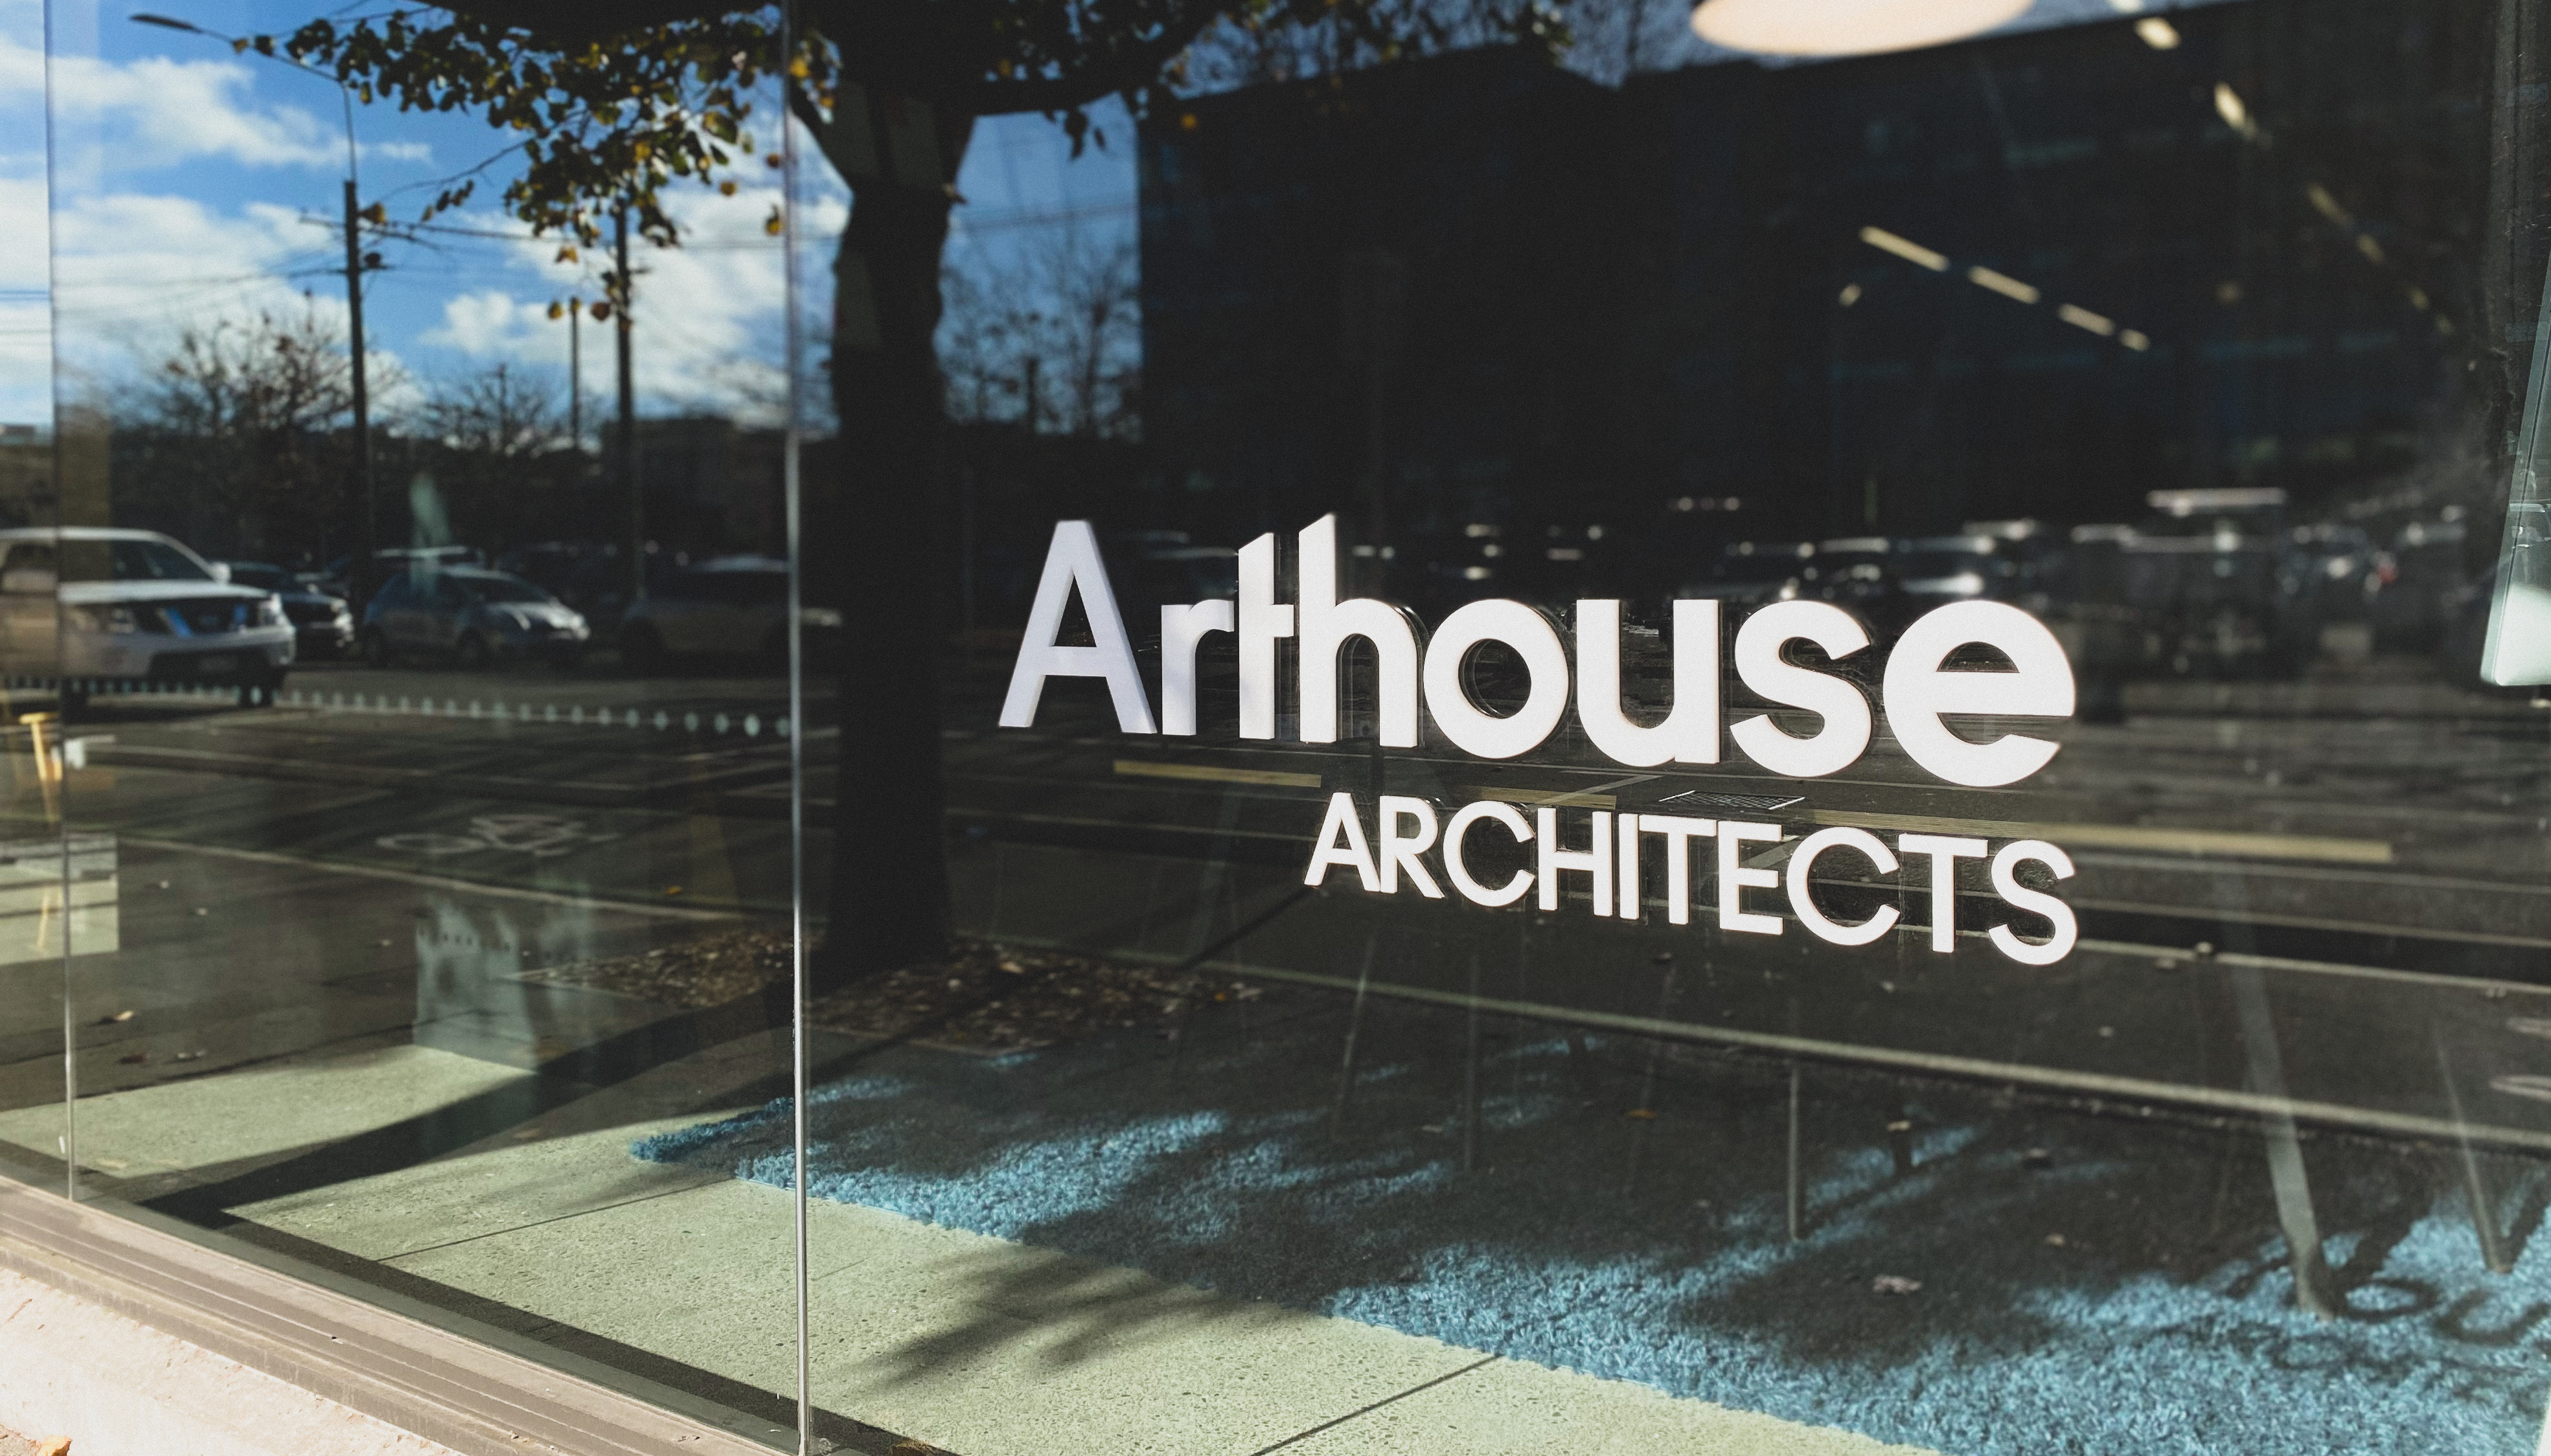 attraction studio arthouse architects brand web